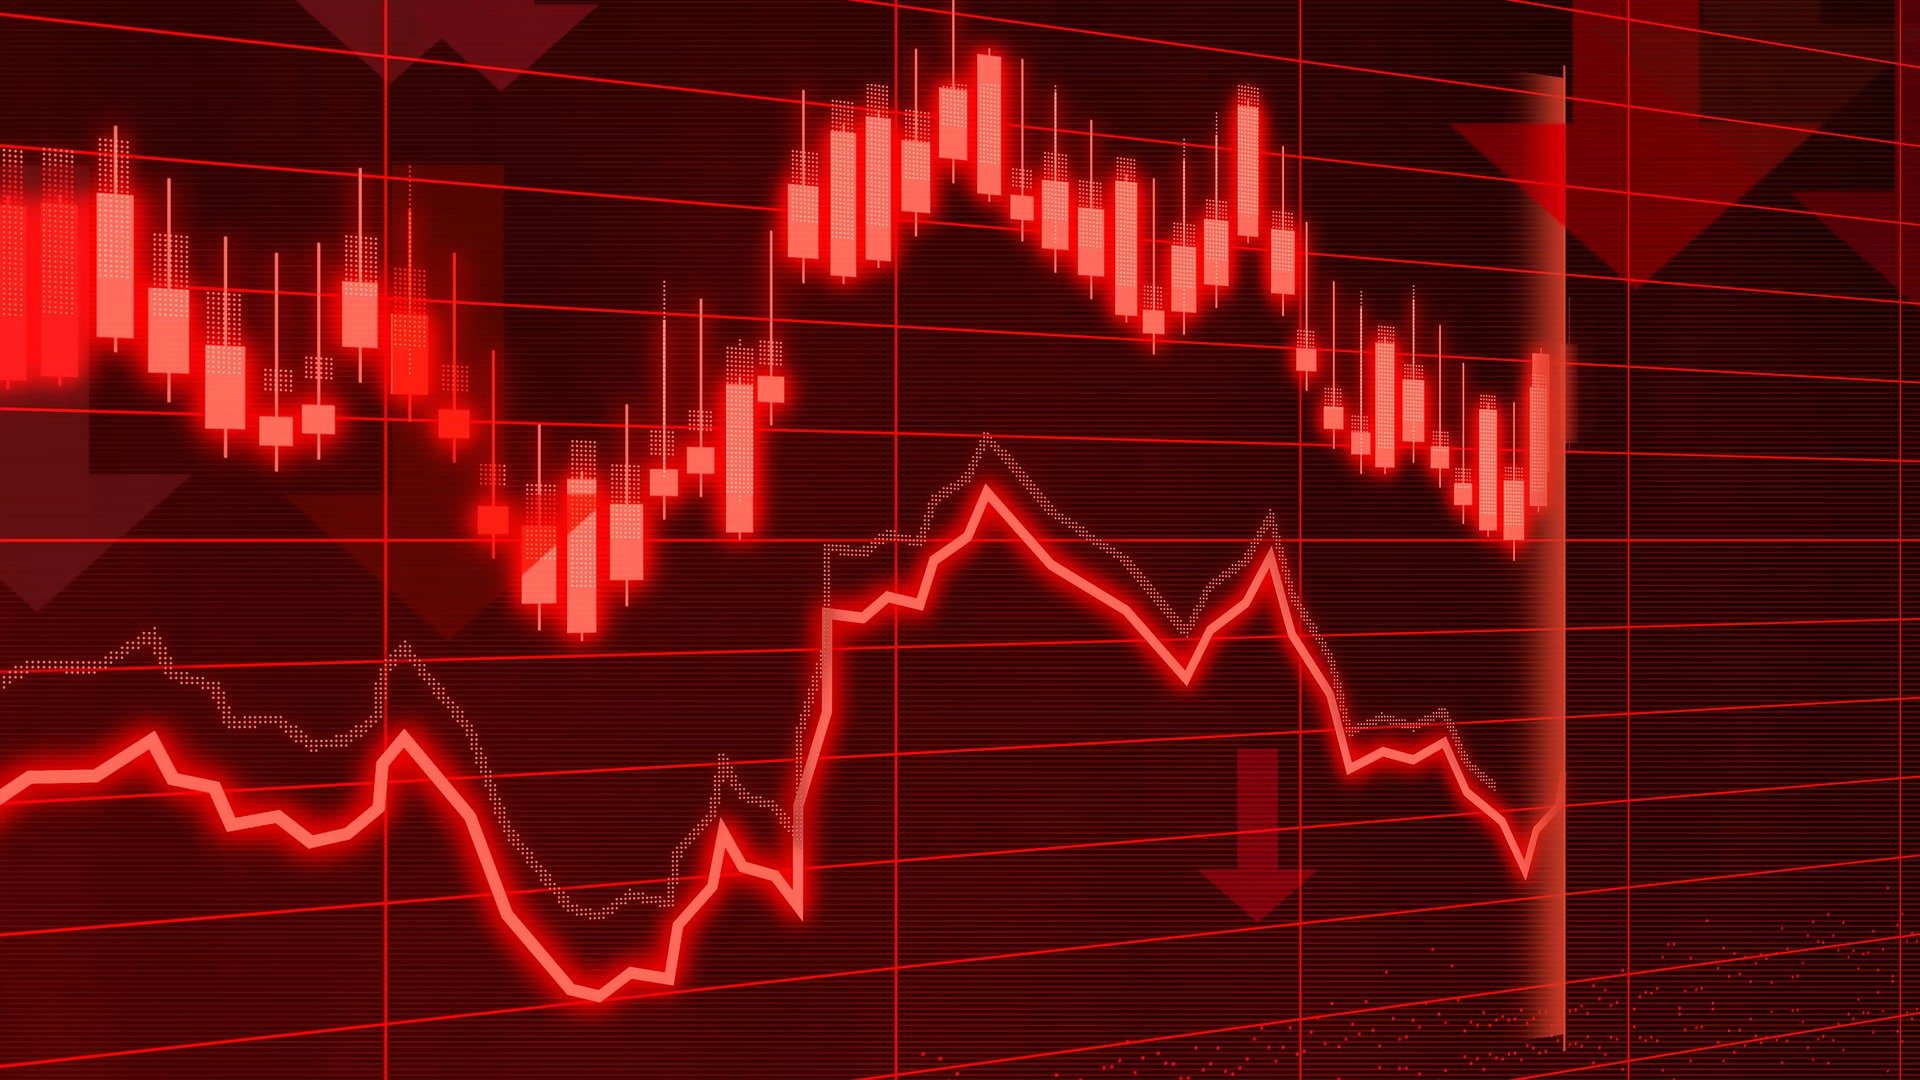 Red stock market illustration